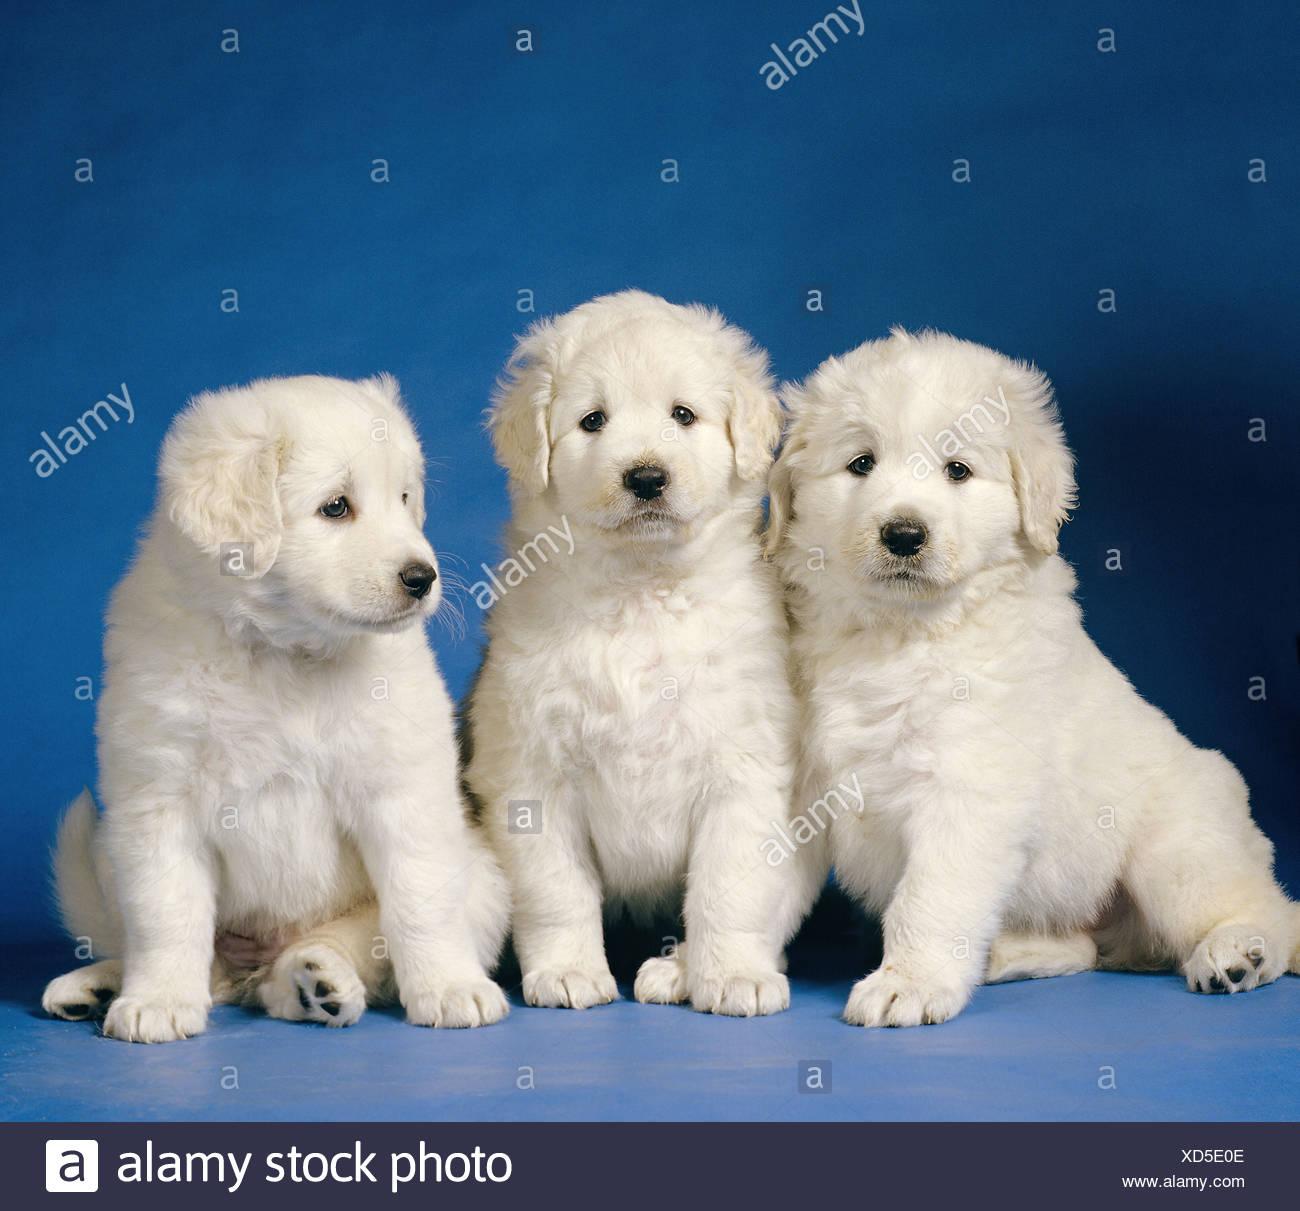 Three Kuvasz Puppies Stock Photo 283477166 Alamy